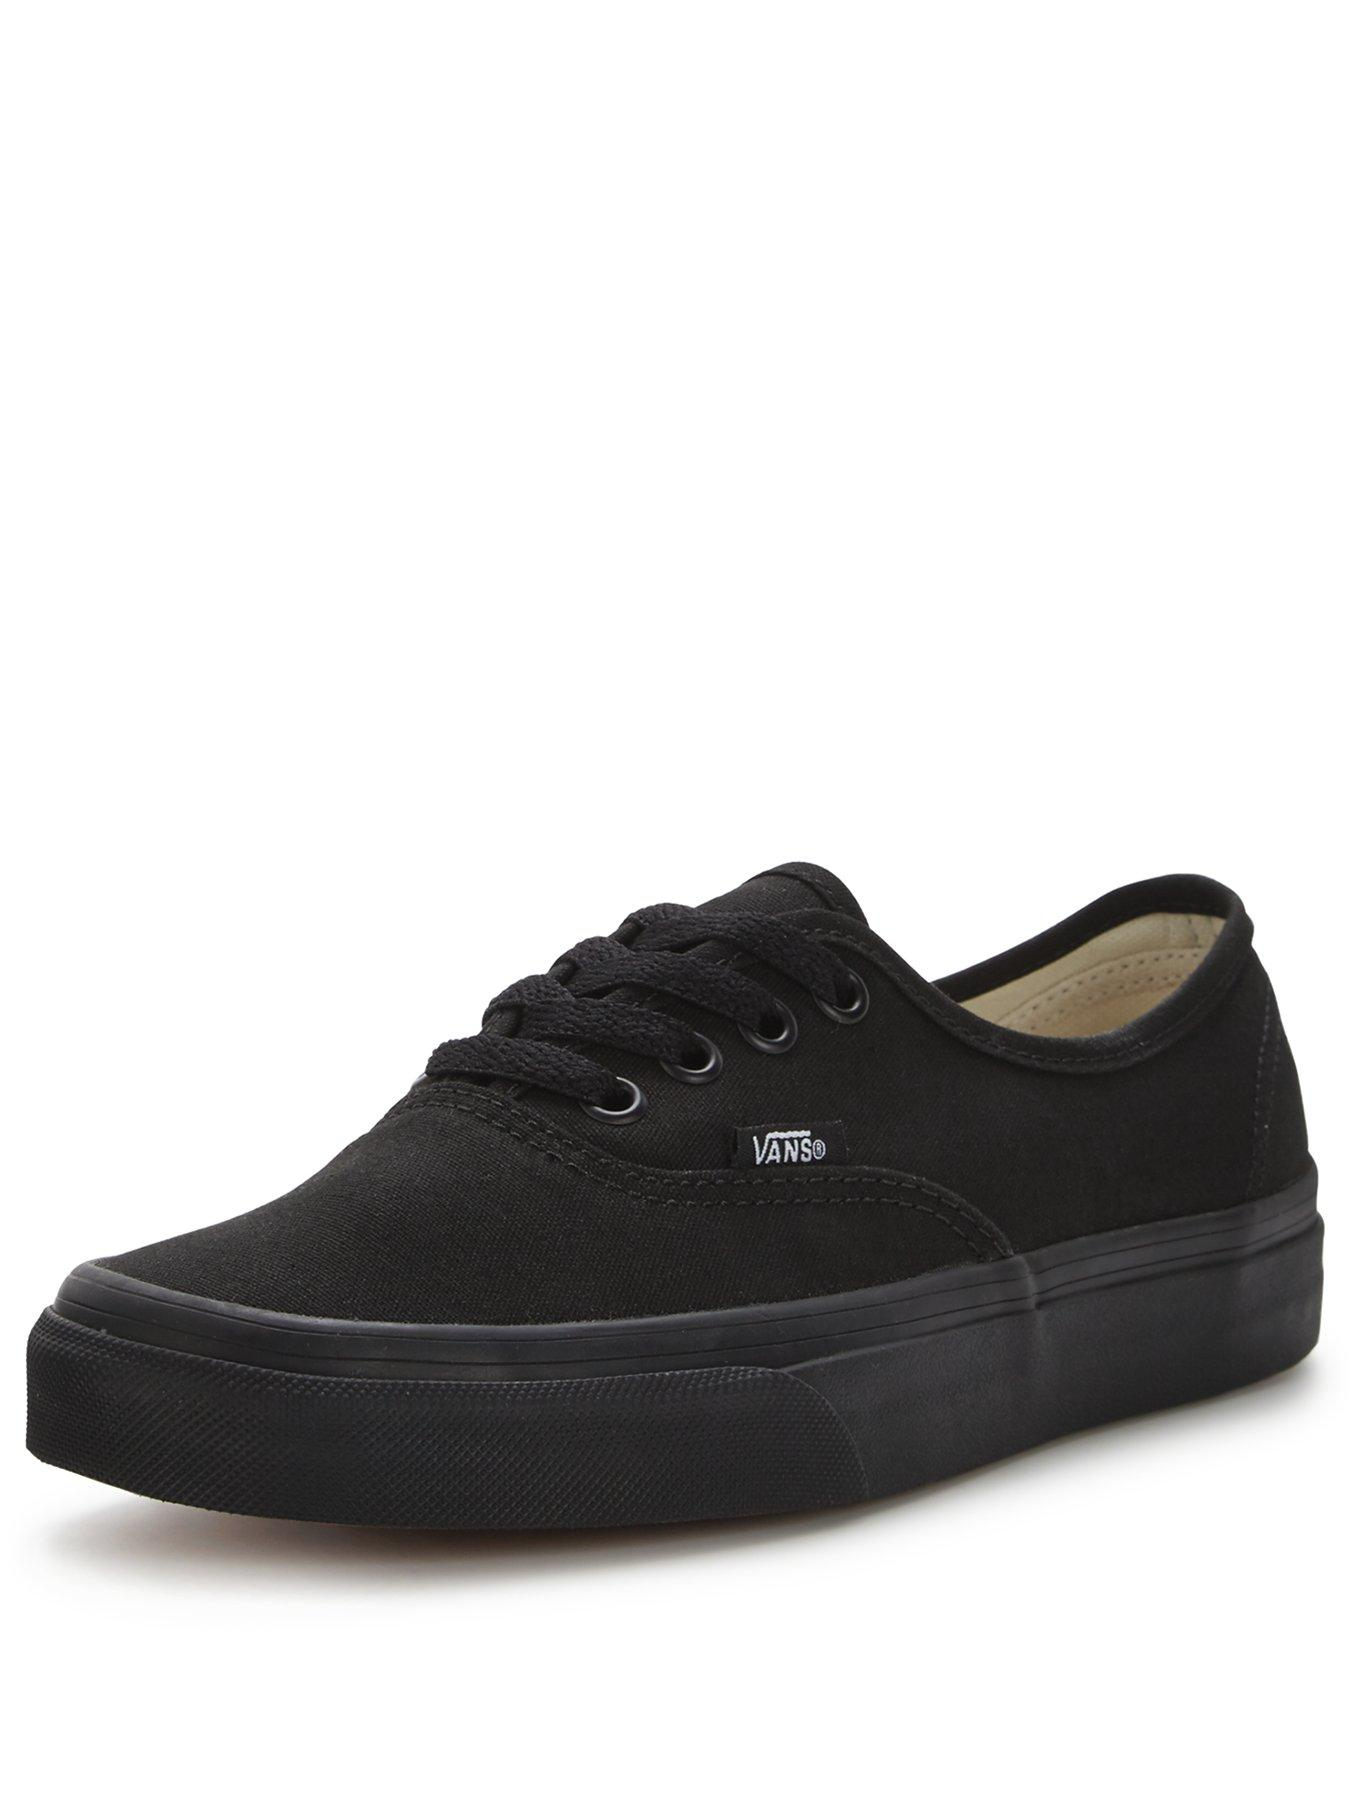 Vans Shoes \u0026 Clothing   Online Store